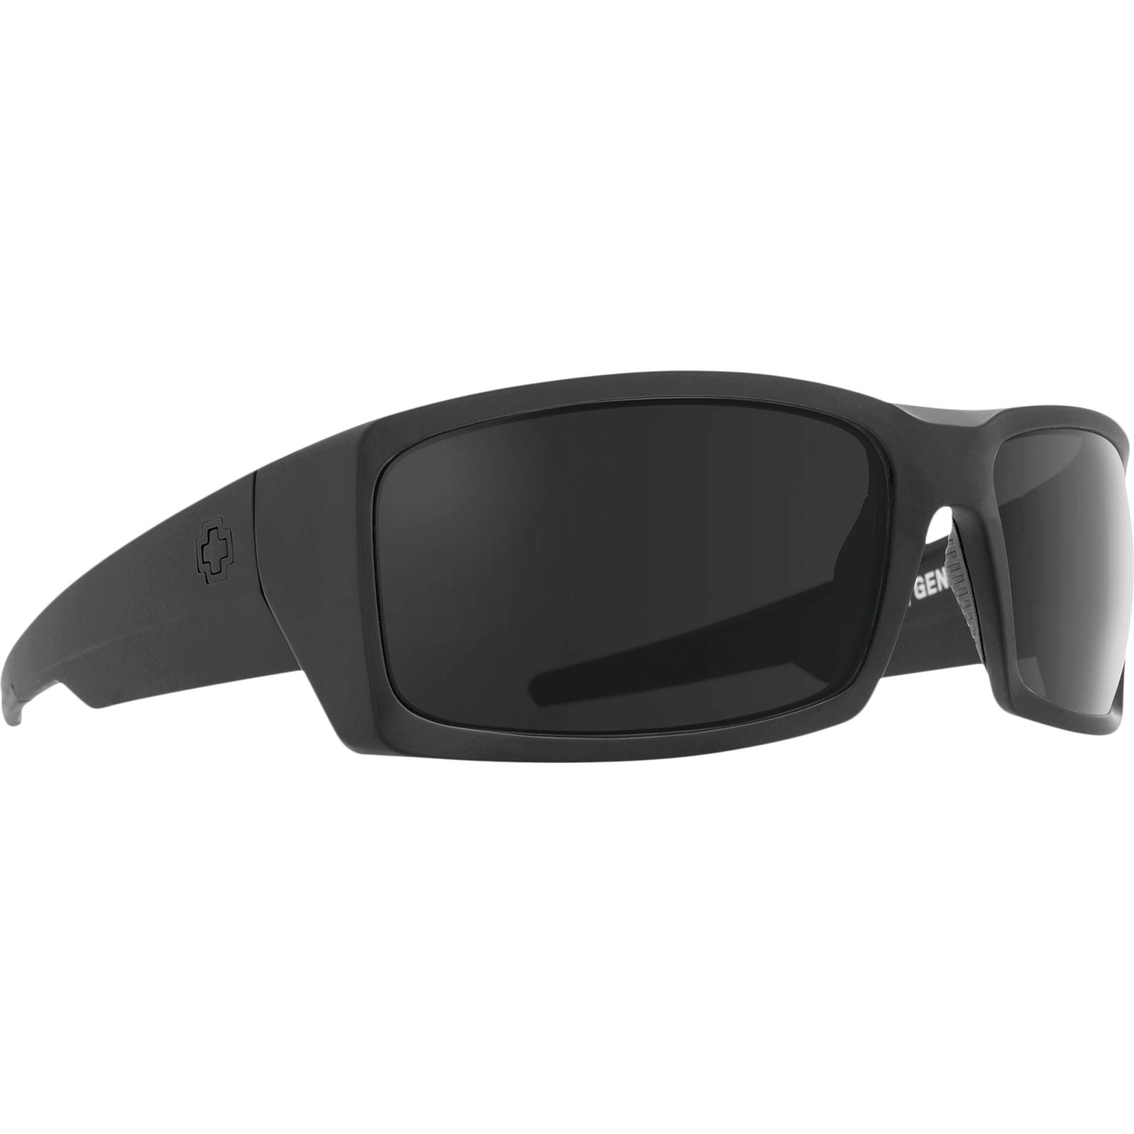 92ecdbe7a01 Spy Optic Standard Issue (sosi) Polarized Sunglasses 683118184135 ...